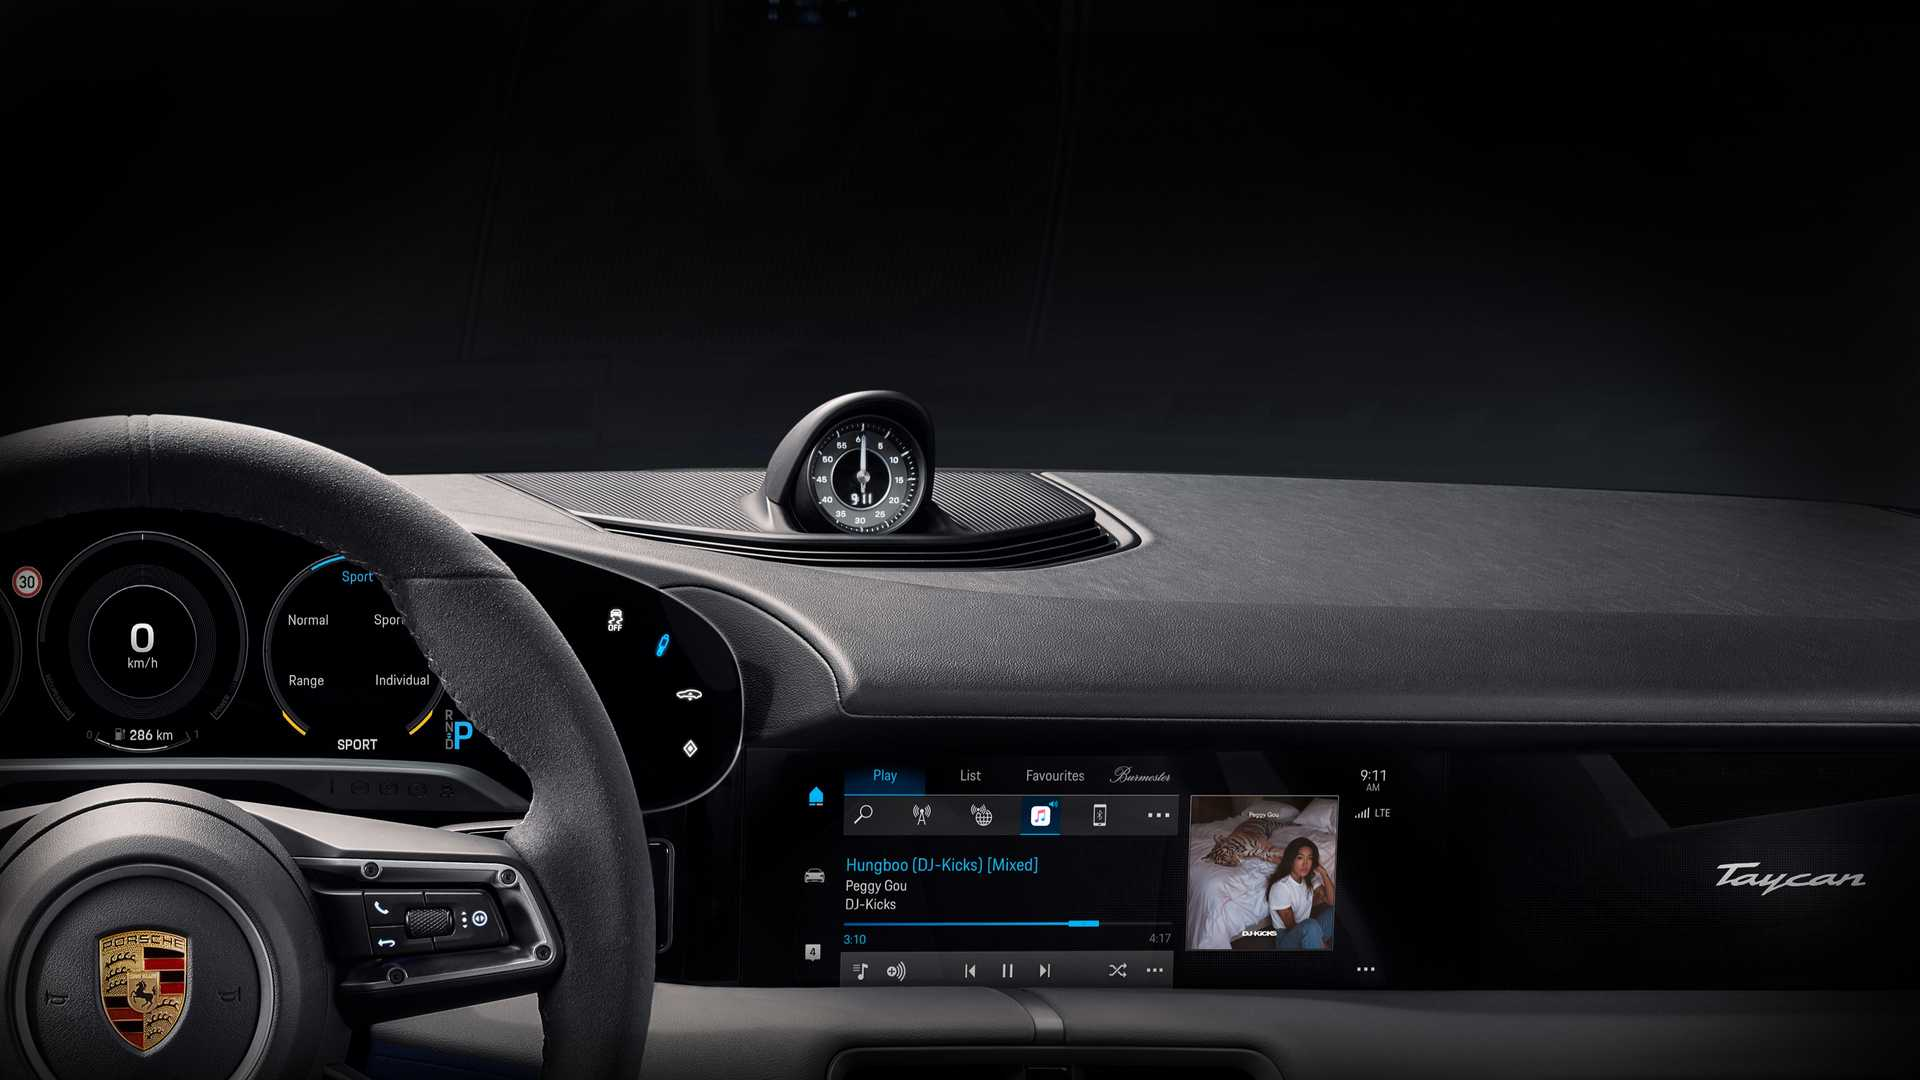 2020 Porsche Taycan Dashboard Partially Revealed With Sleek